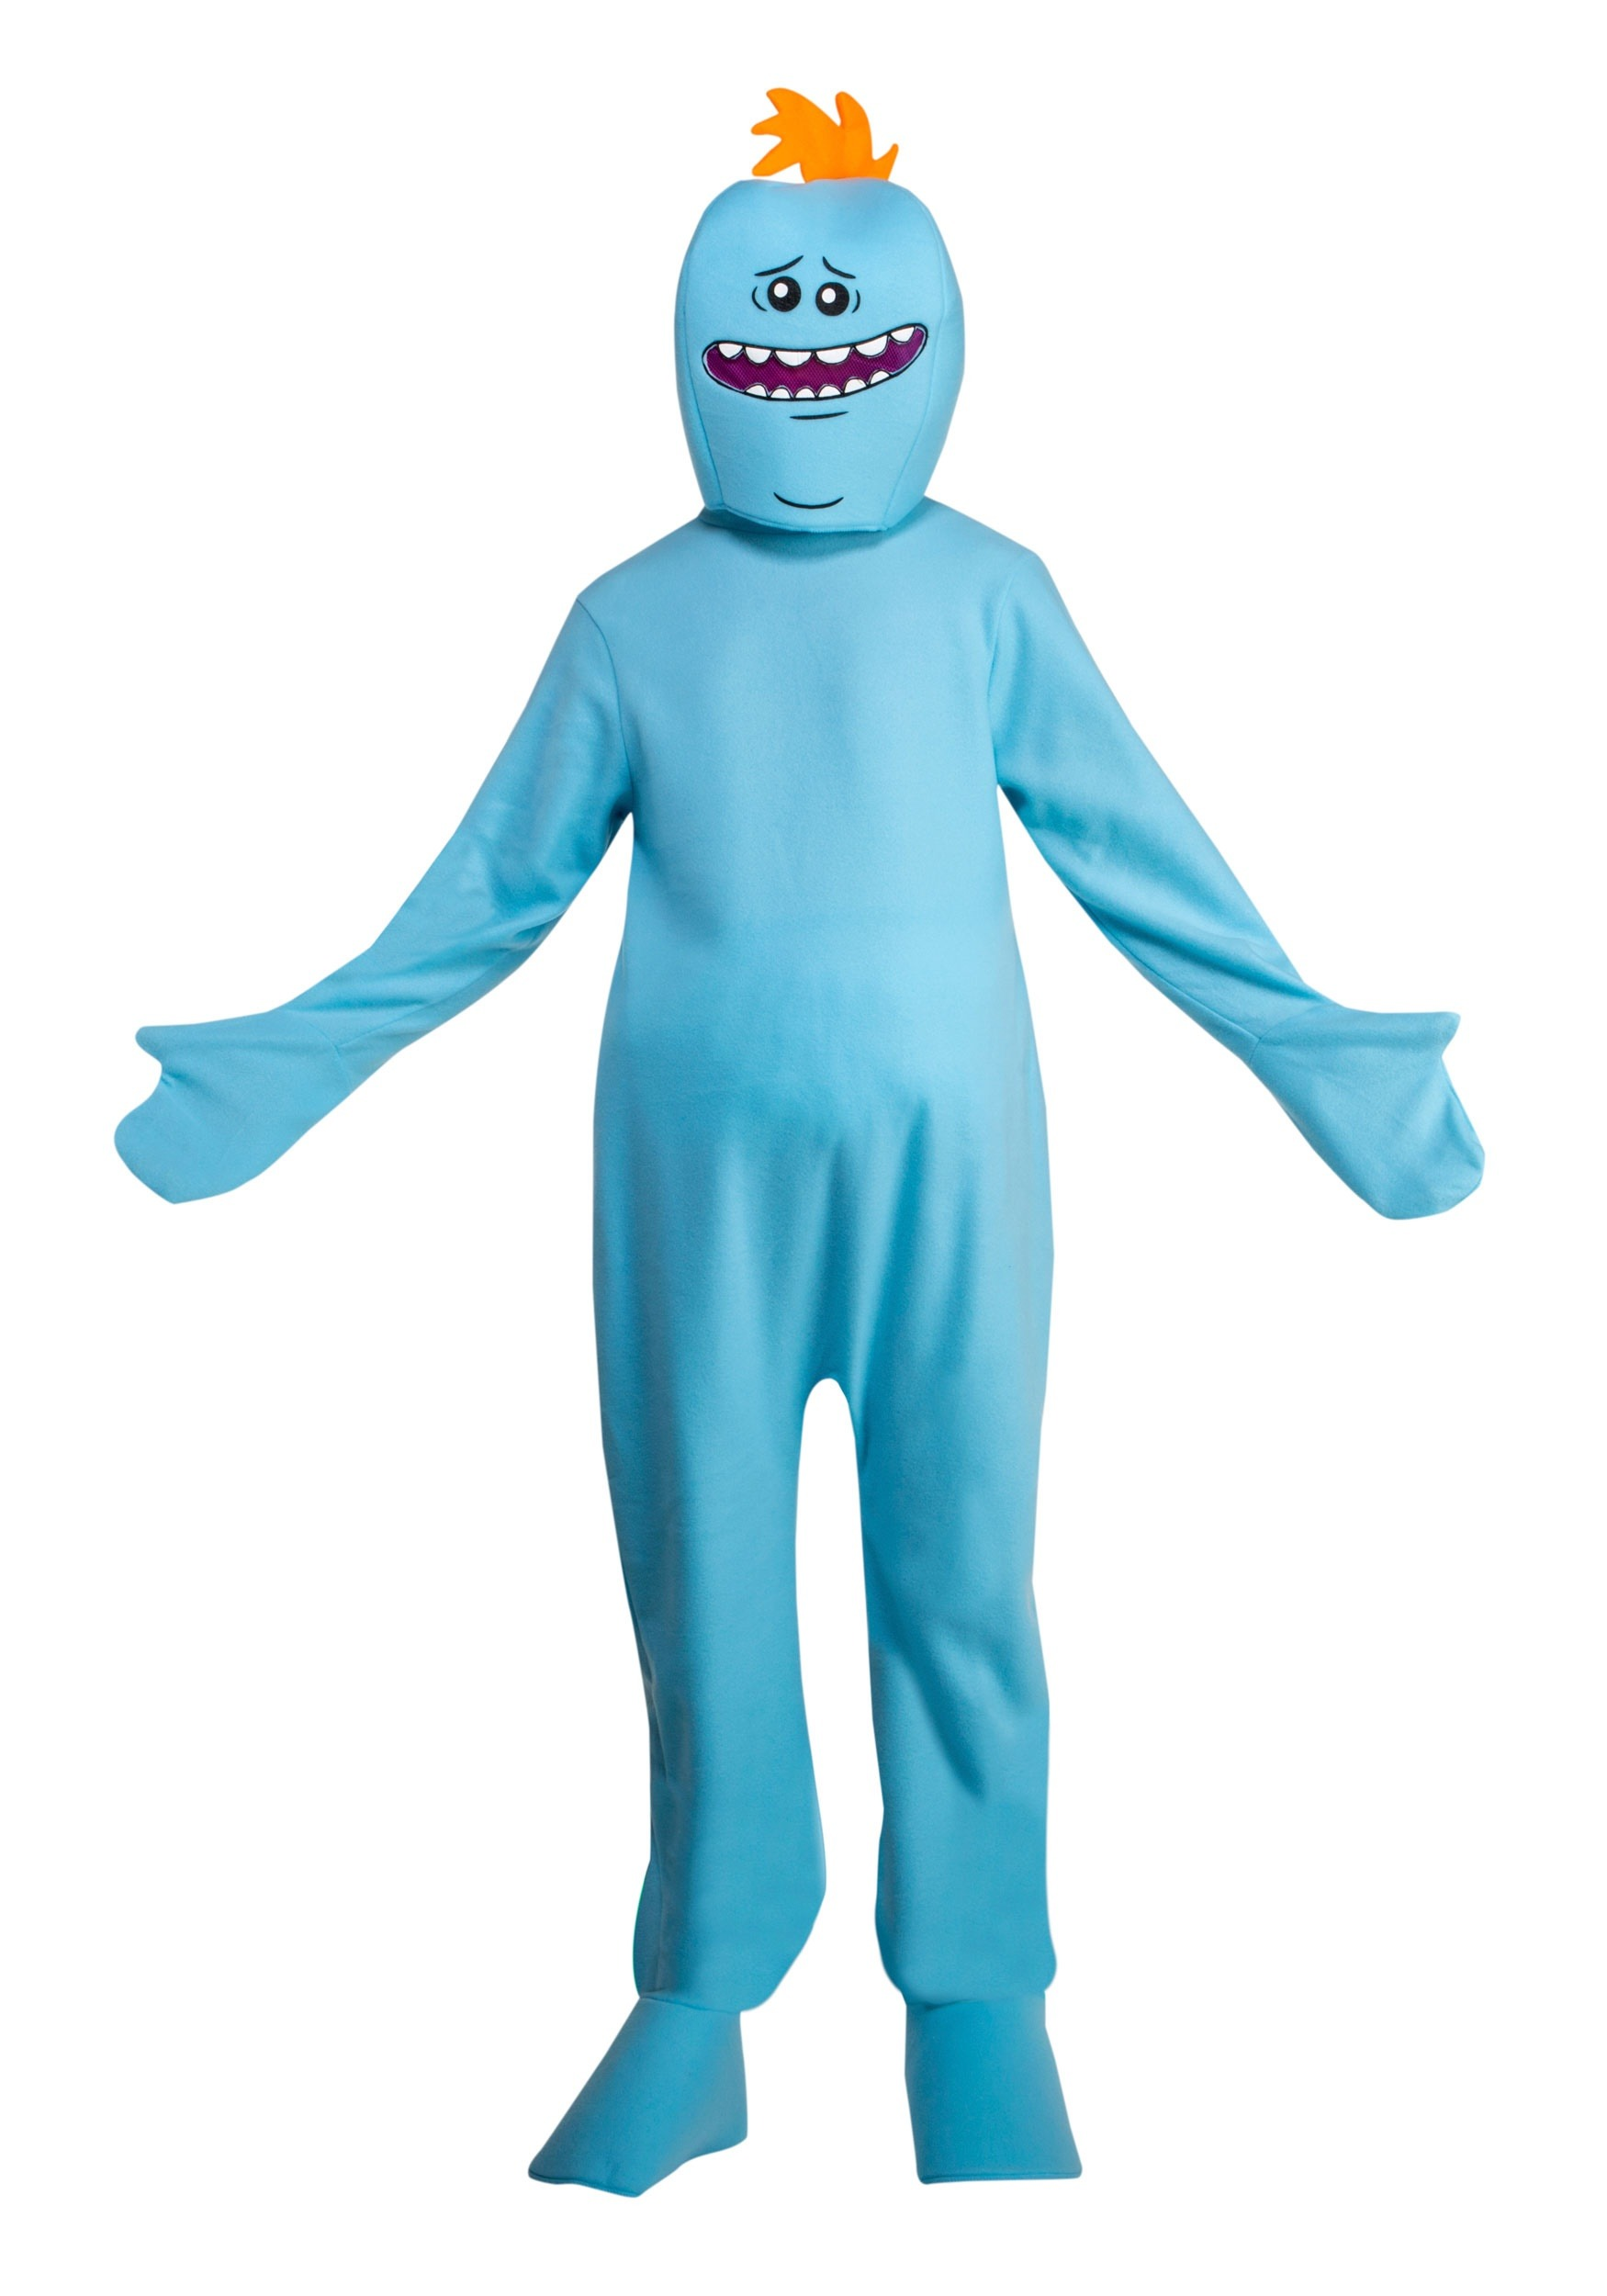 Rick and Morty Mr. Meeseeks Adult Costume